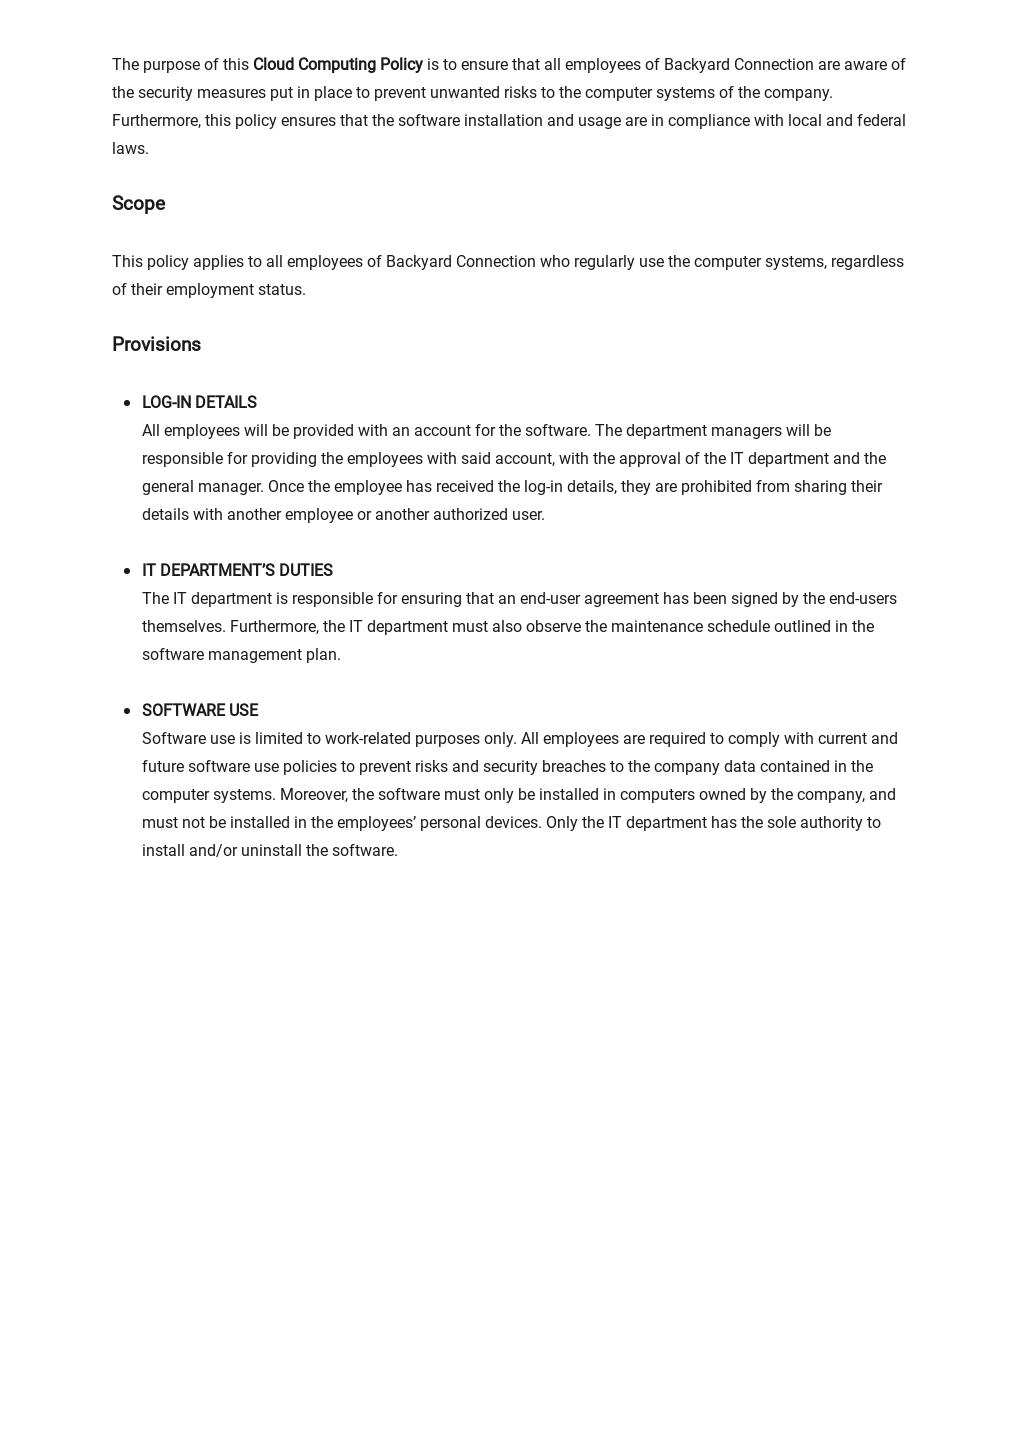 Cloud Computing Policy Template 1.jpe